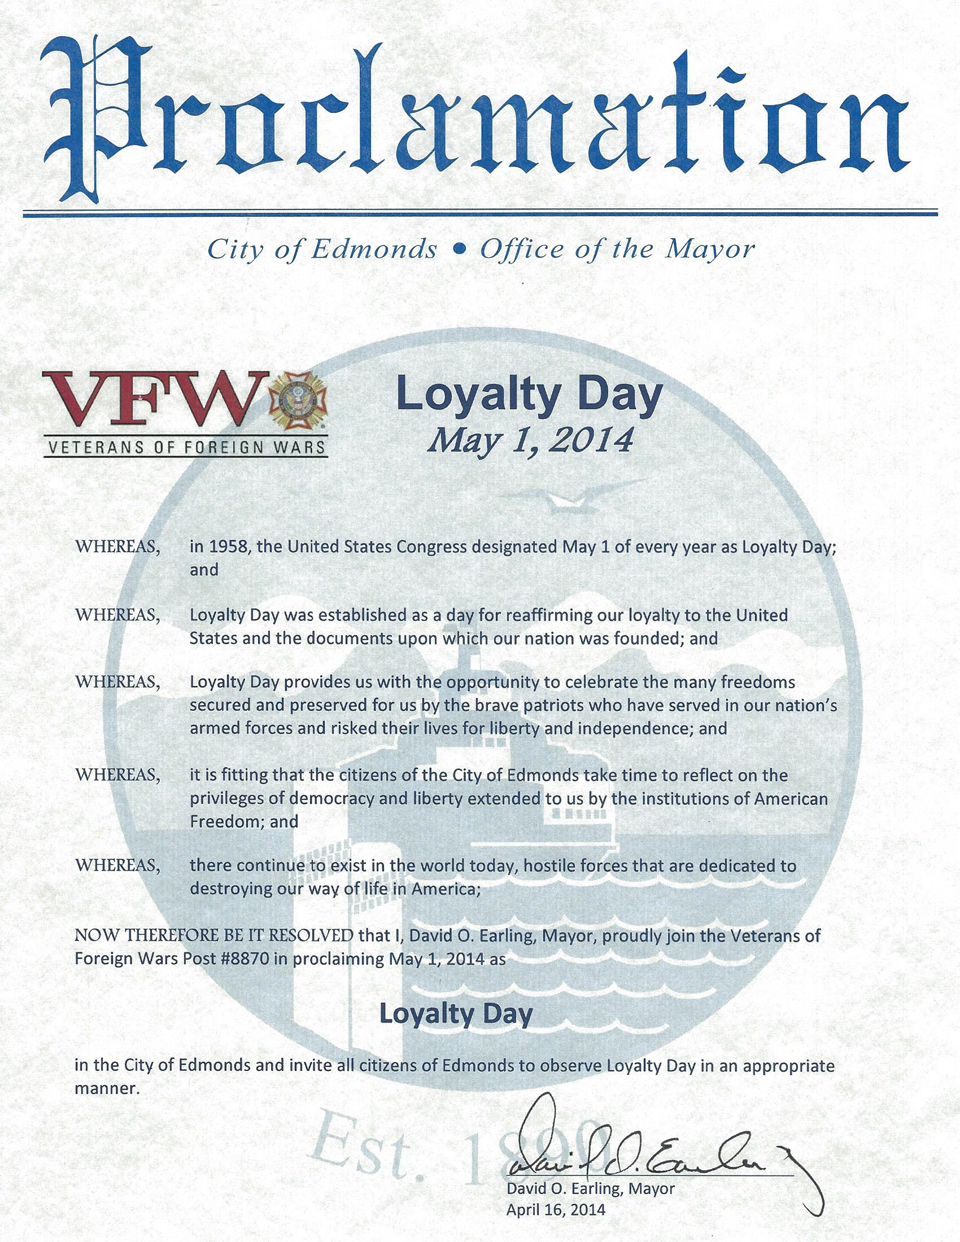 Proclamation Loyalty Day, City of Edmonds, May 1, 2014